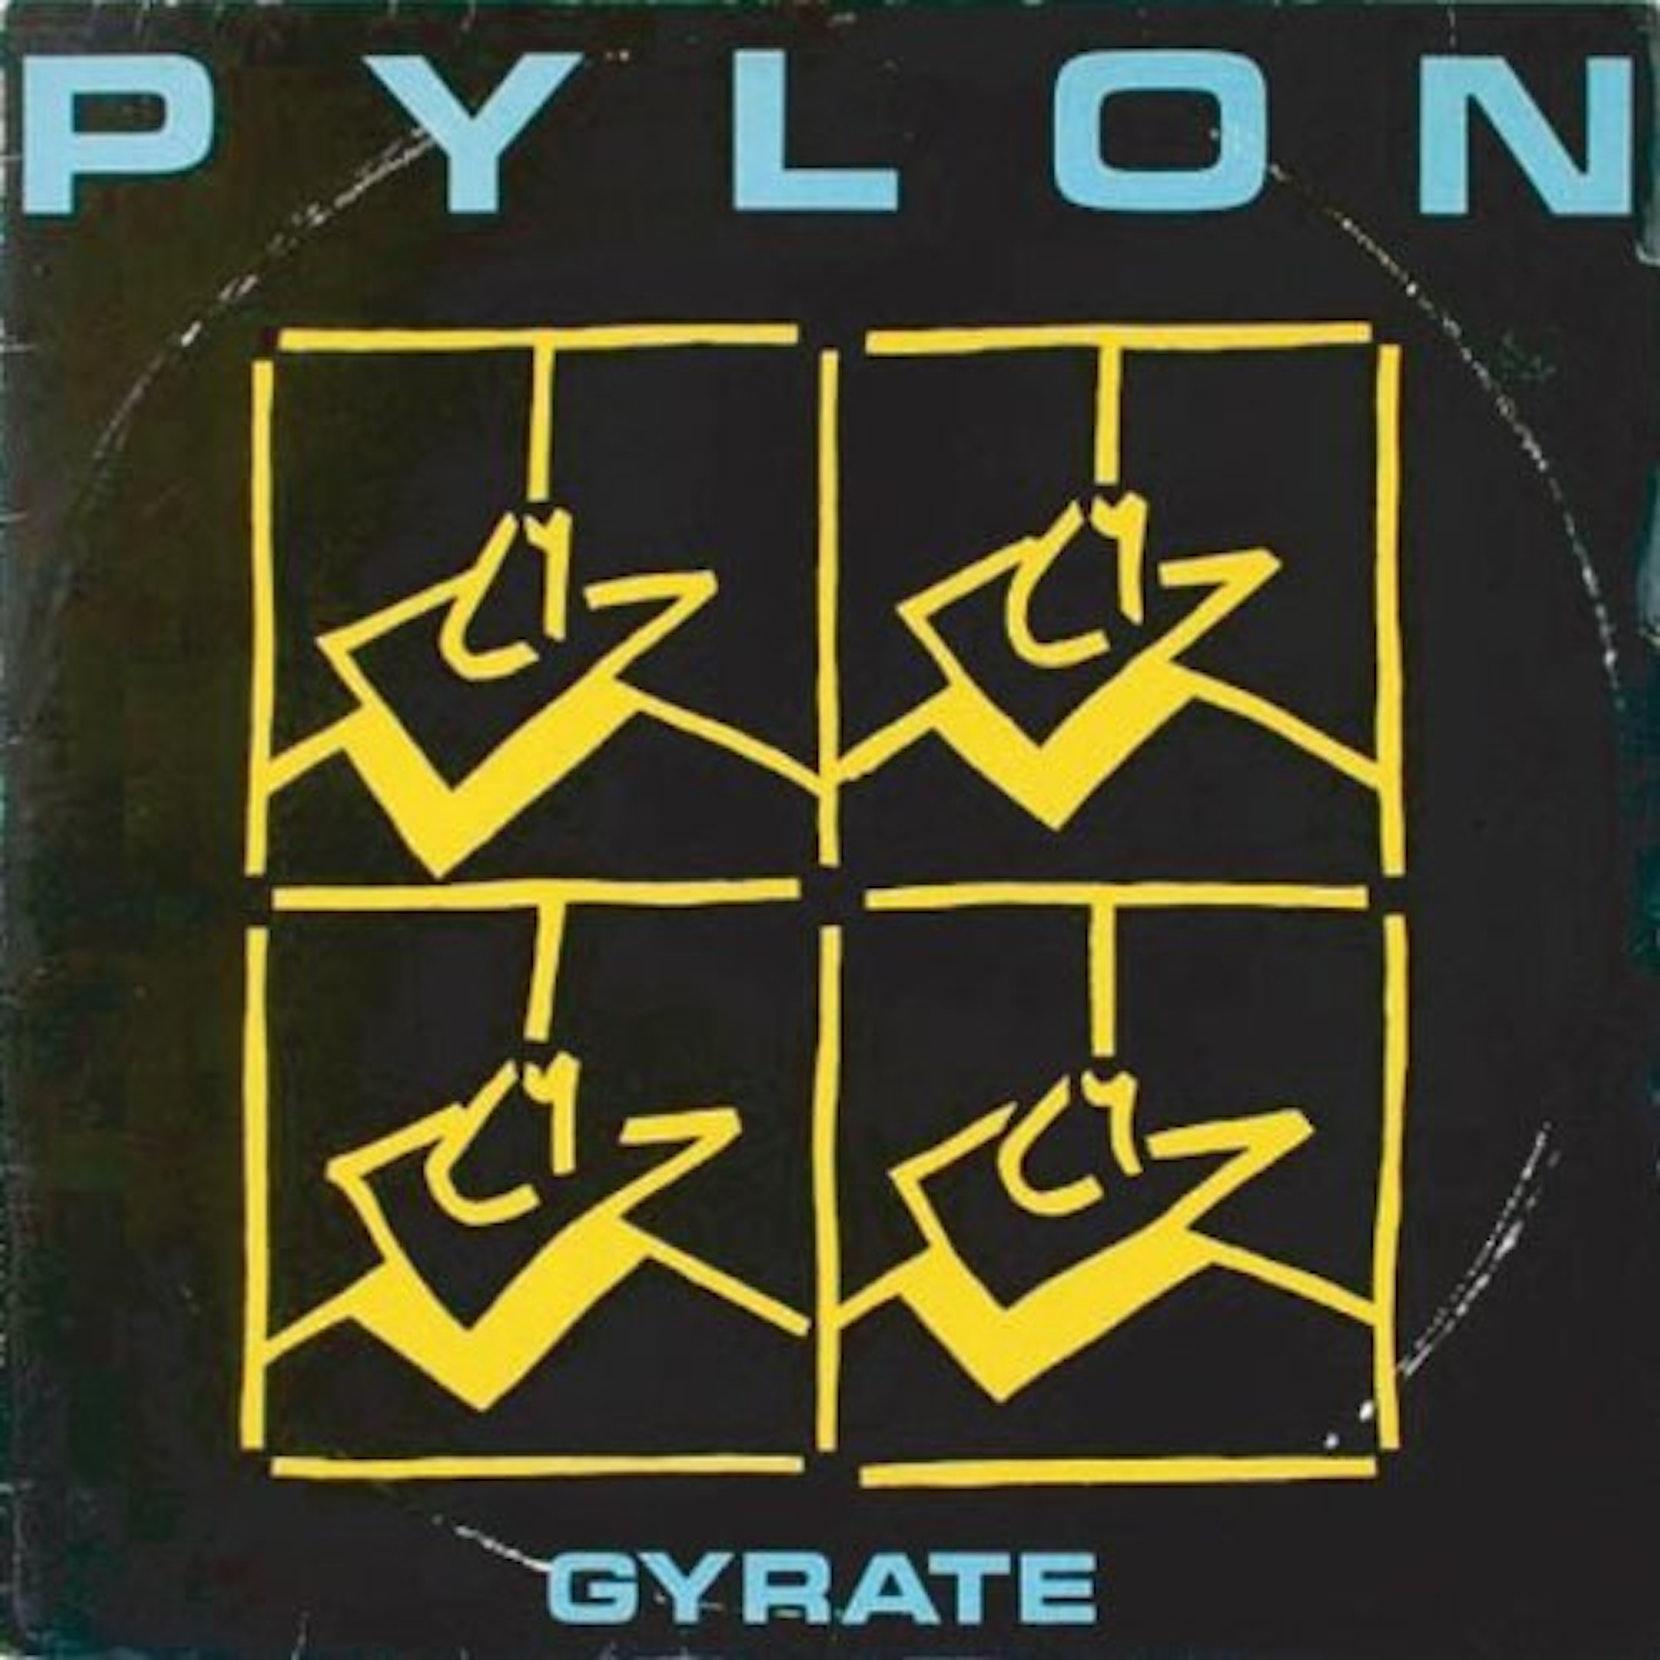 The 10 Best Post-Punk Albums To Own On Vinyl — Vinyl Me, Please